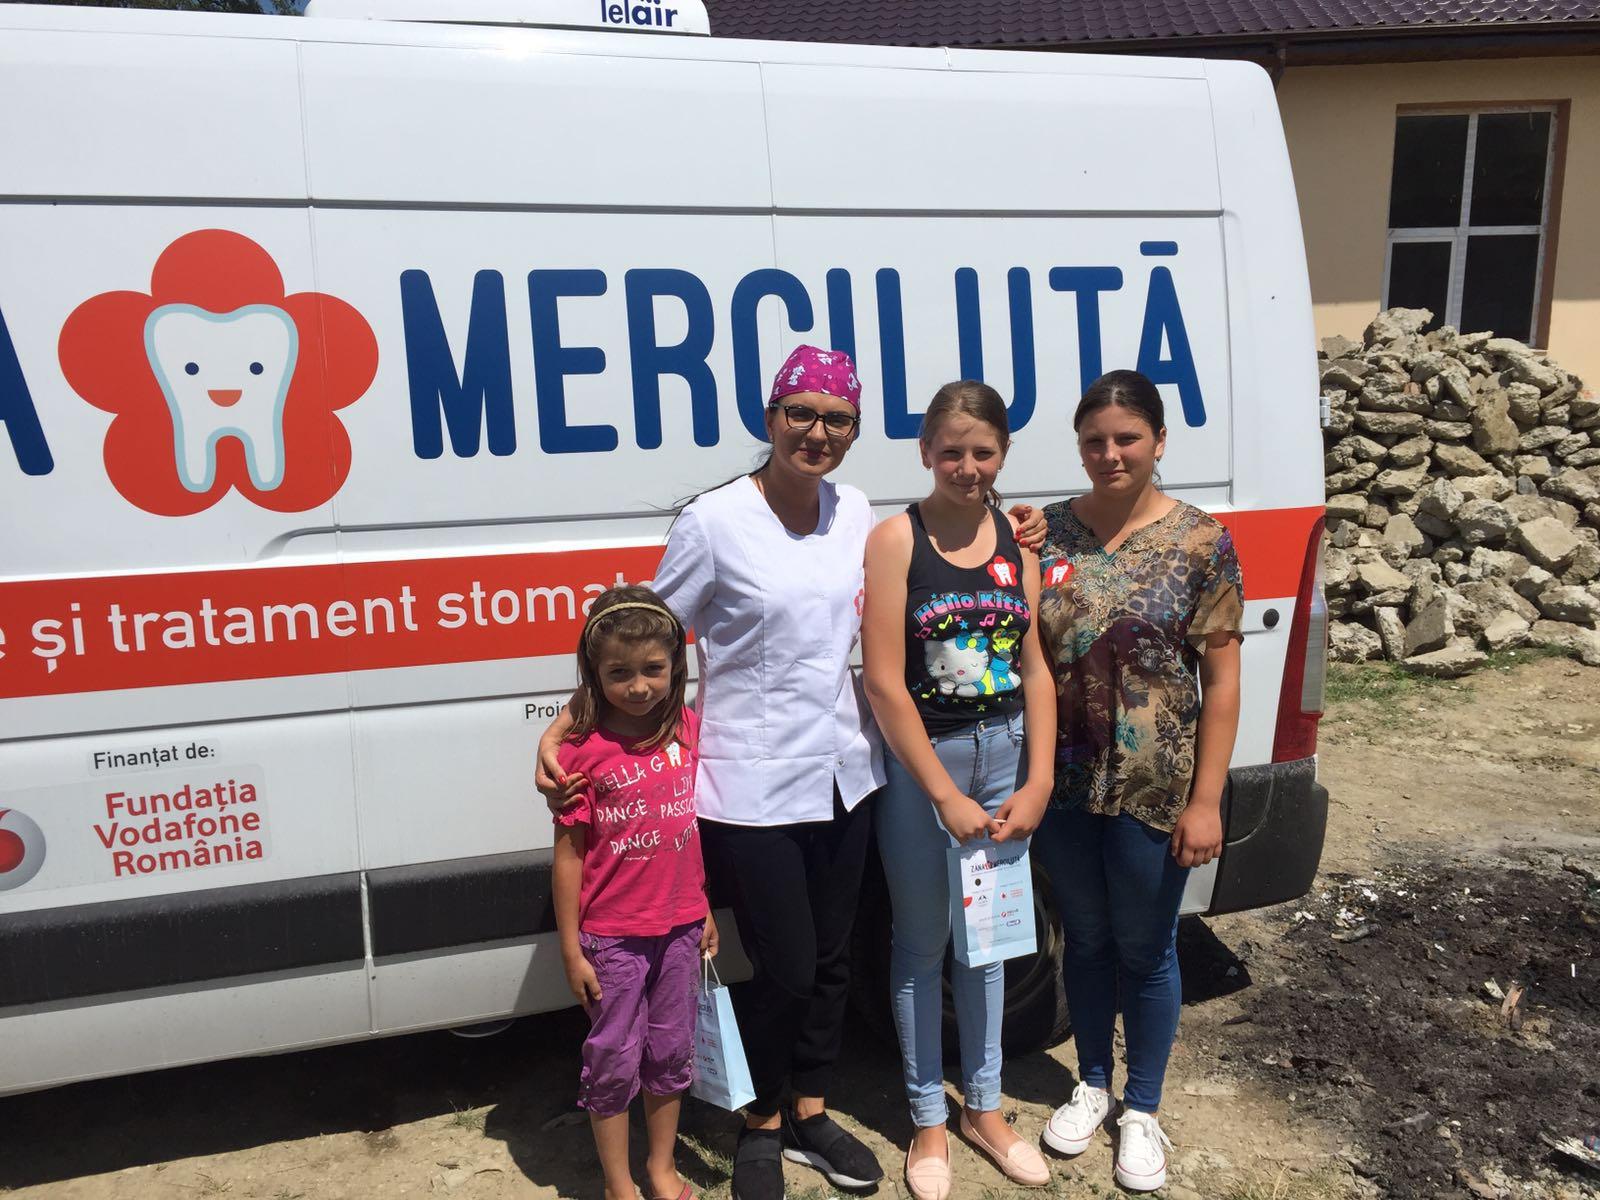 Zana Merciluta - cabinet stomatologic mobil care acorda gratuit profilaxie si tratament copiilor cazuri umanitare